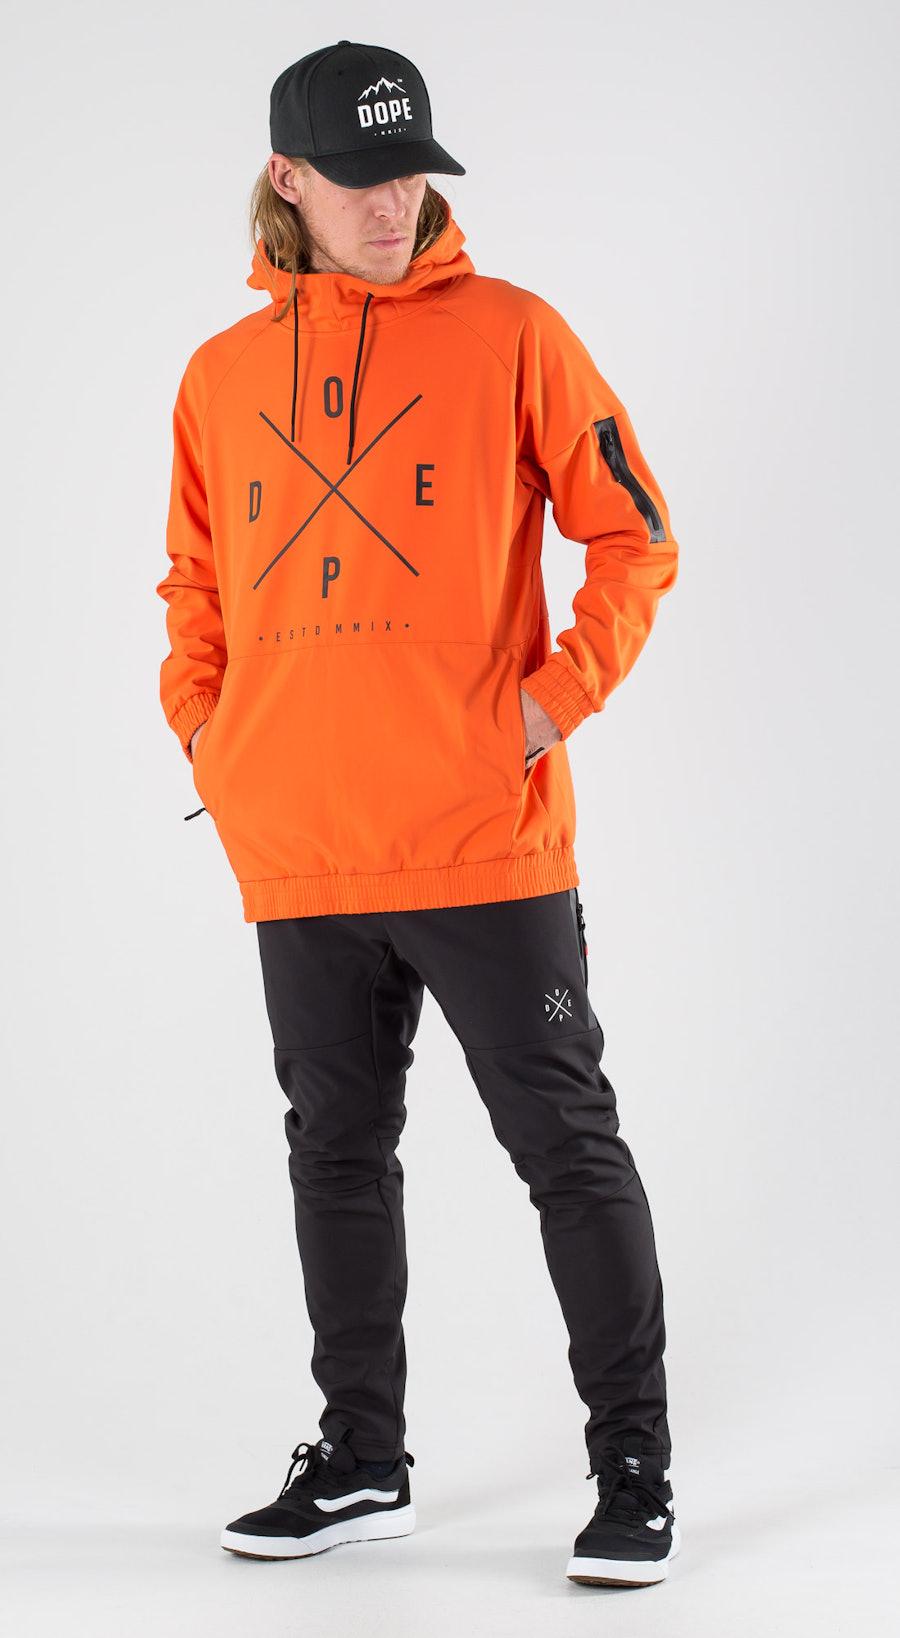 Dope Rambler Orange Outfit Multi